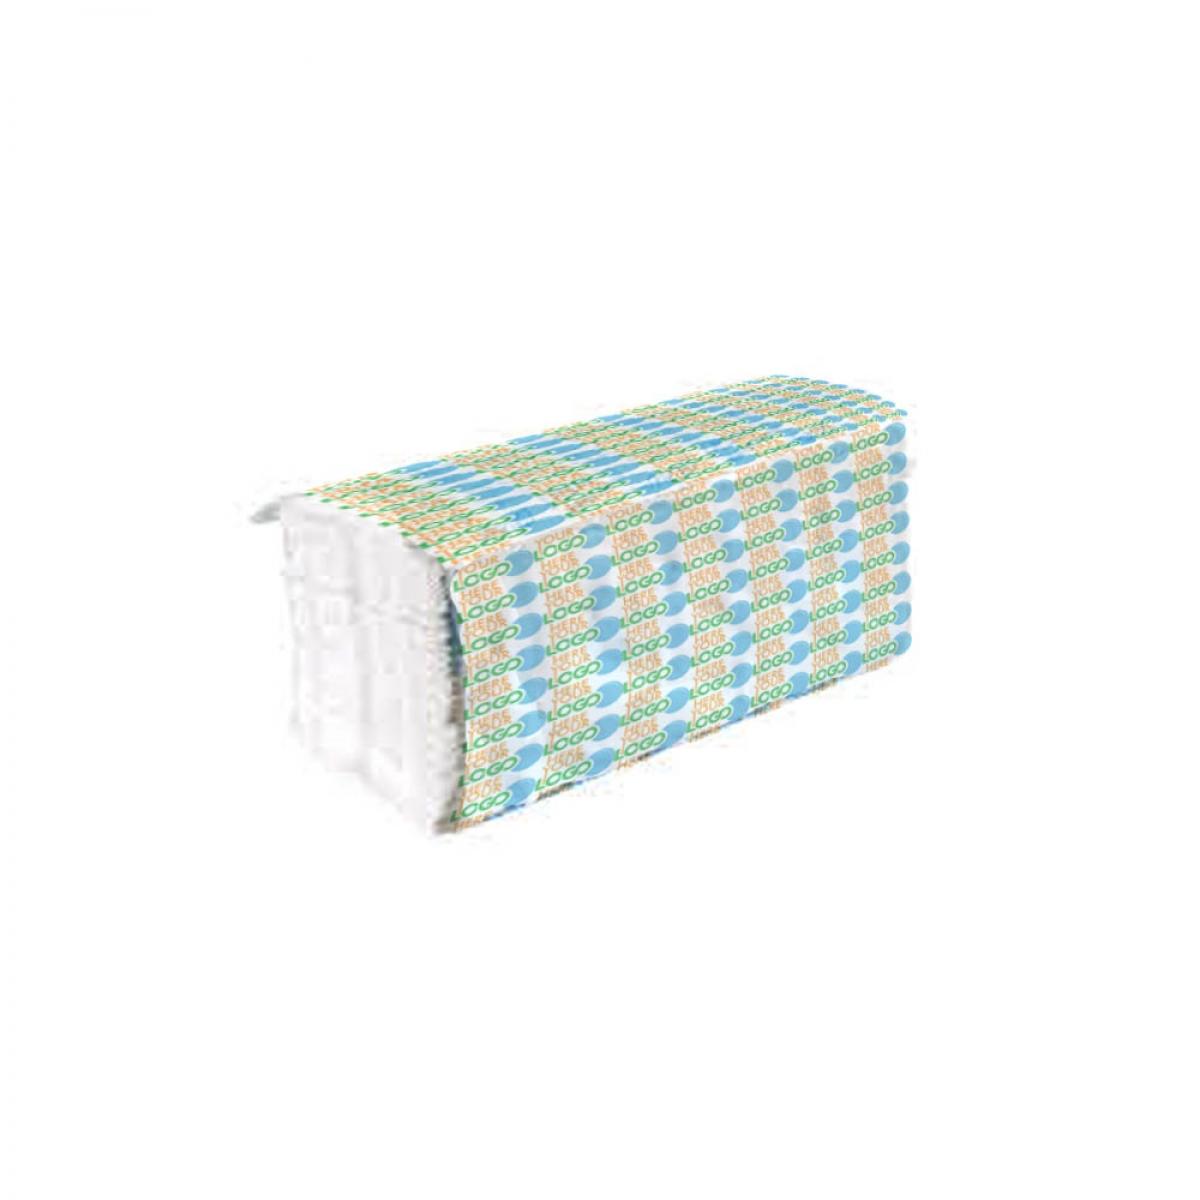 folded tissue 28.5*21